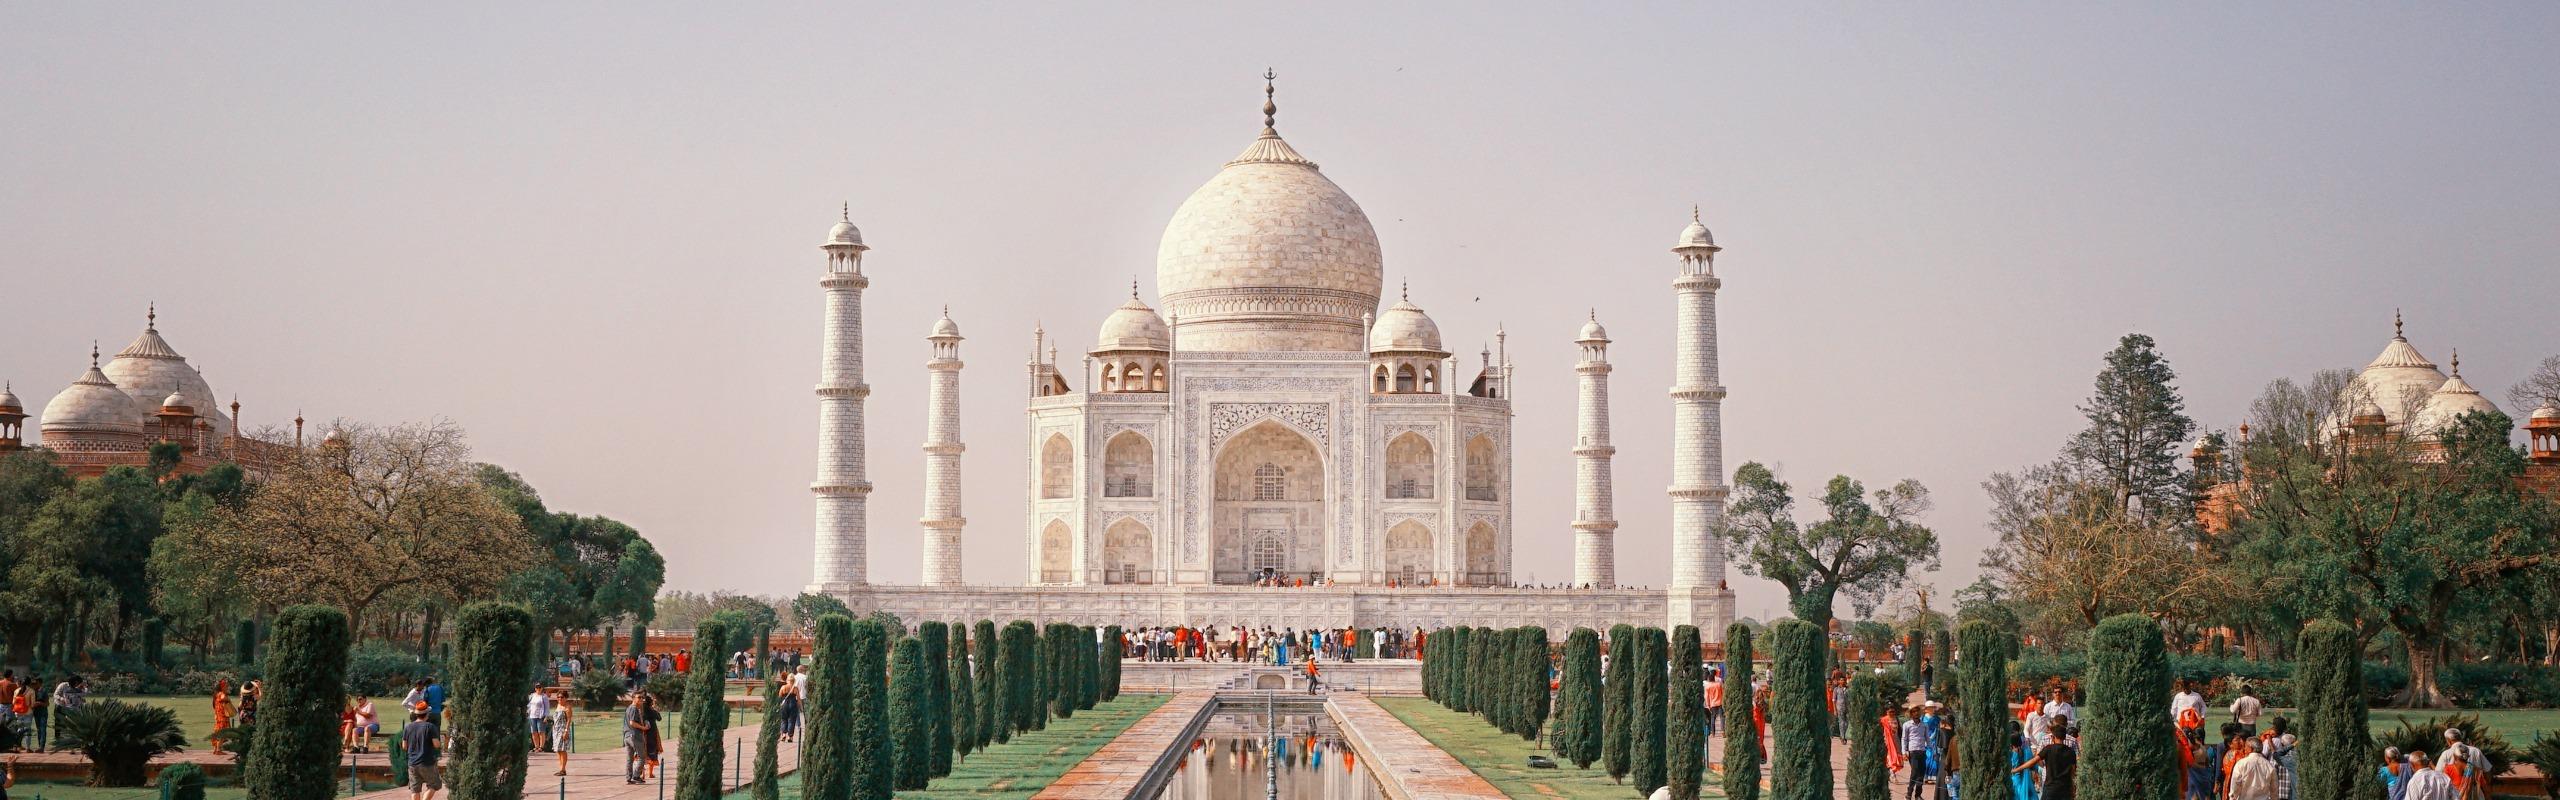 Taj Mahal Architecture -Top 10 Architectural Features of Taj Mahal